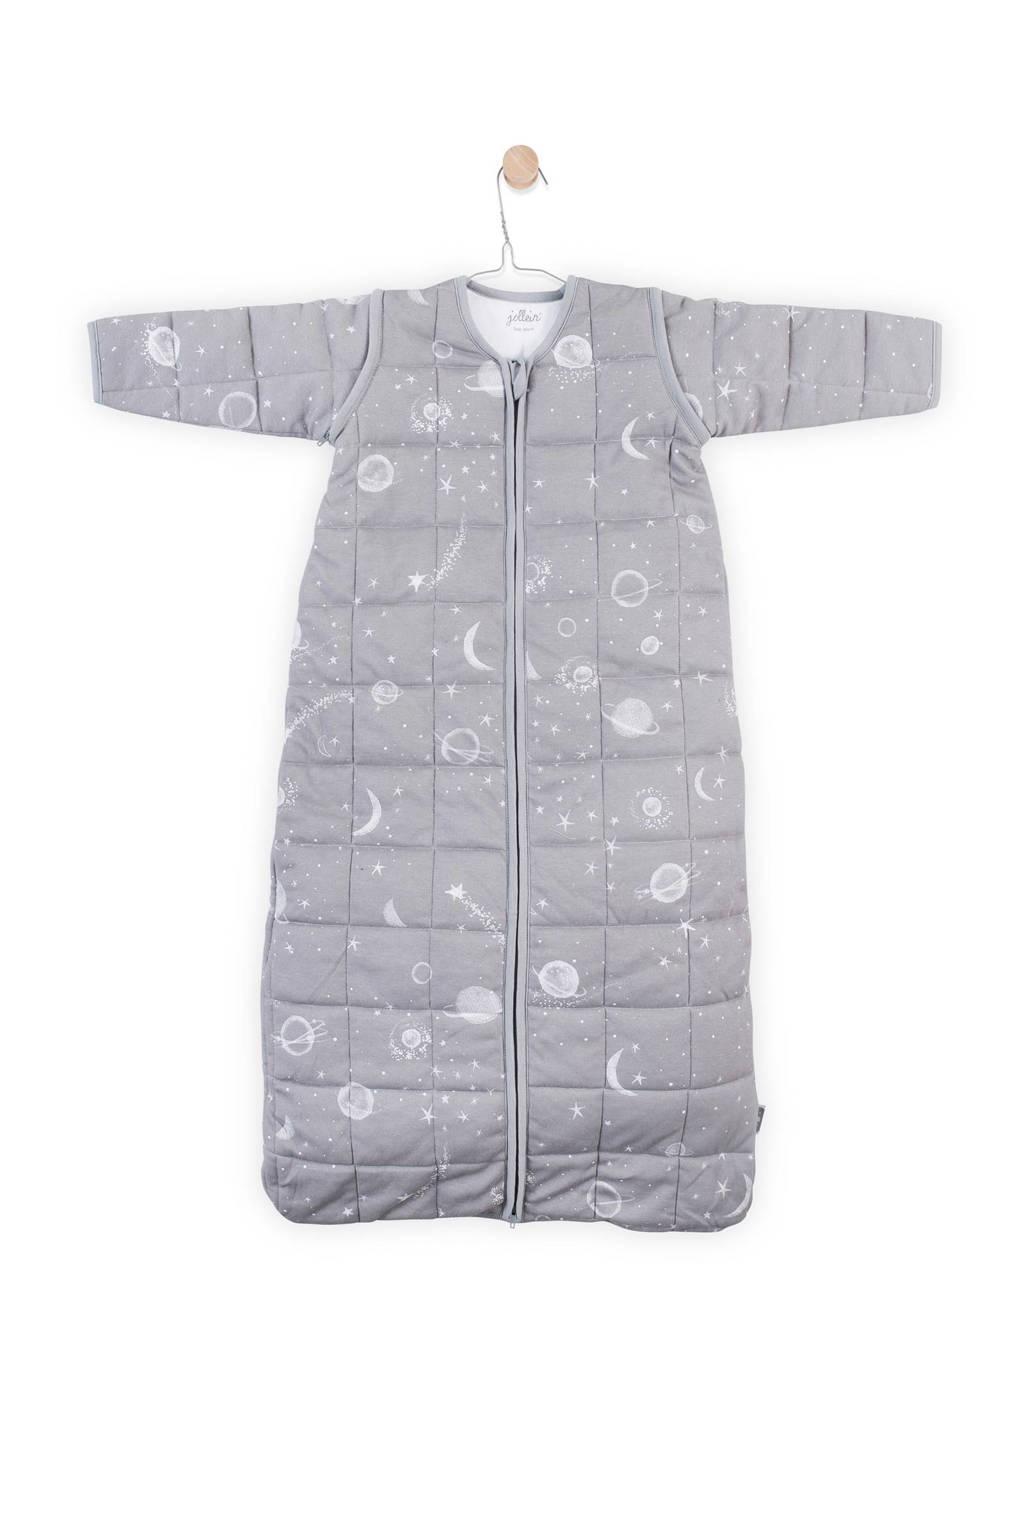 Jollein Galaxy baby slaapzak 4-seizoenen 70 cm grey, Galaxy grey